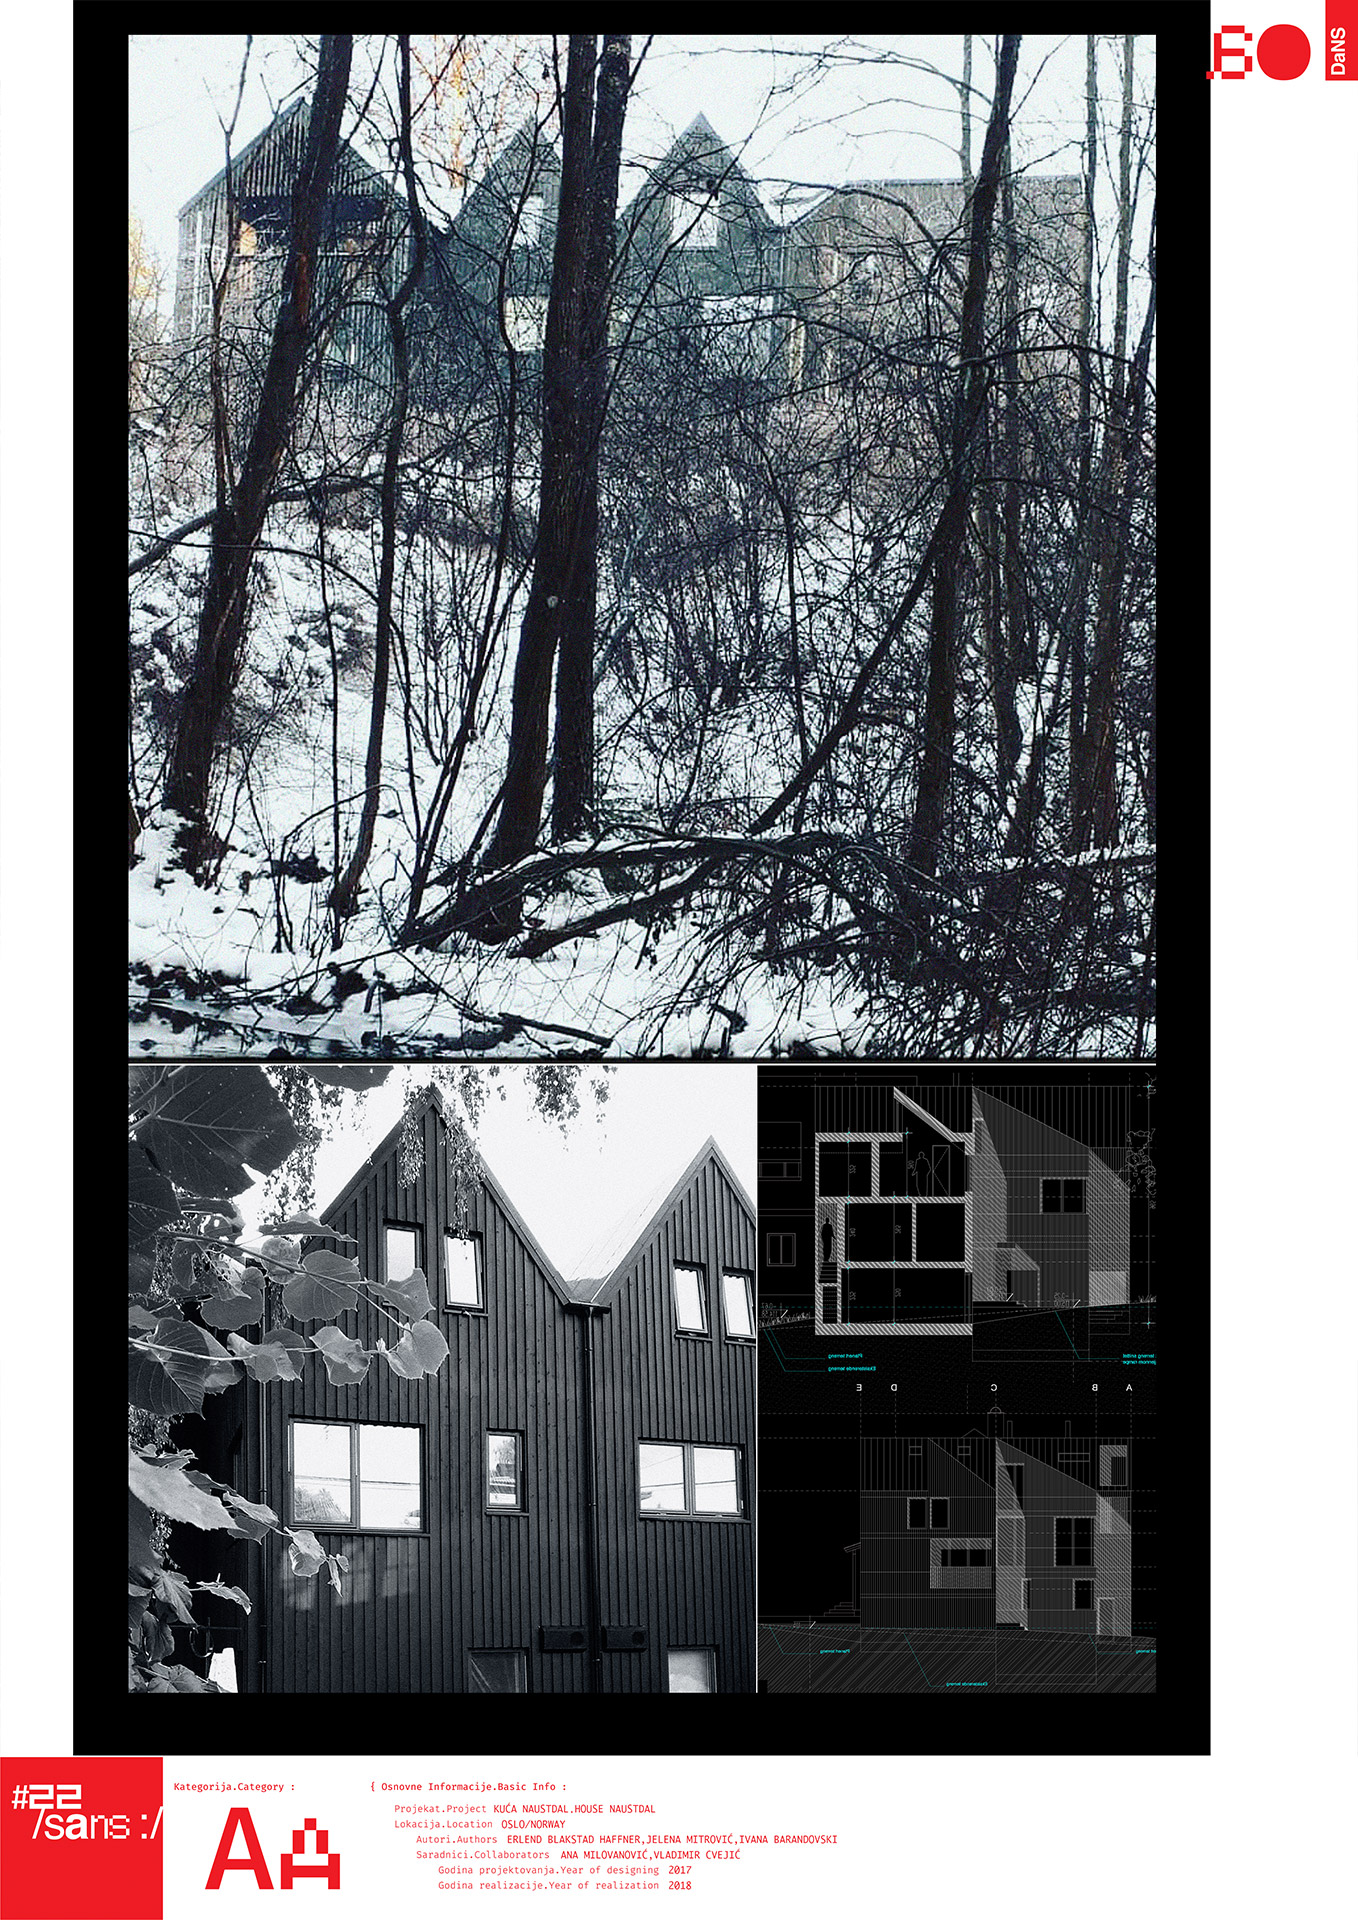 "<p class=""naslov-br"">aa08</p>Kuća Naustdal // Naustdal House"